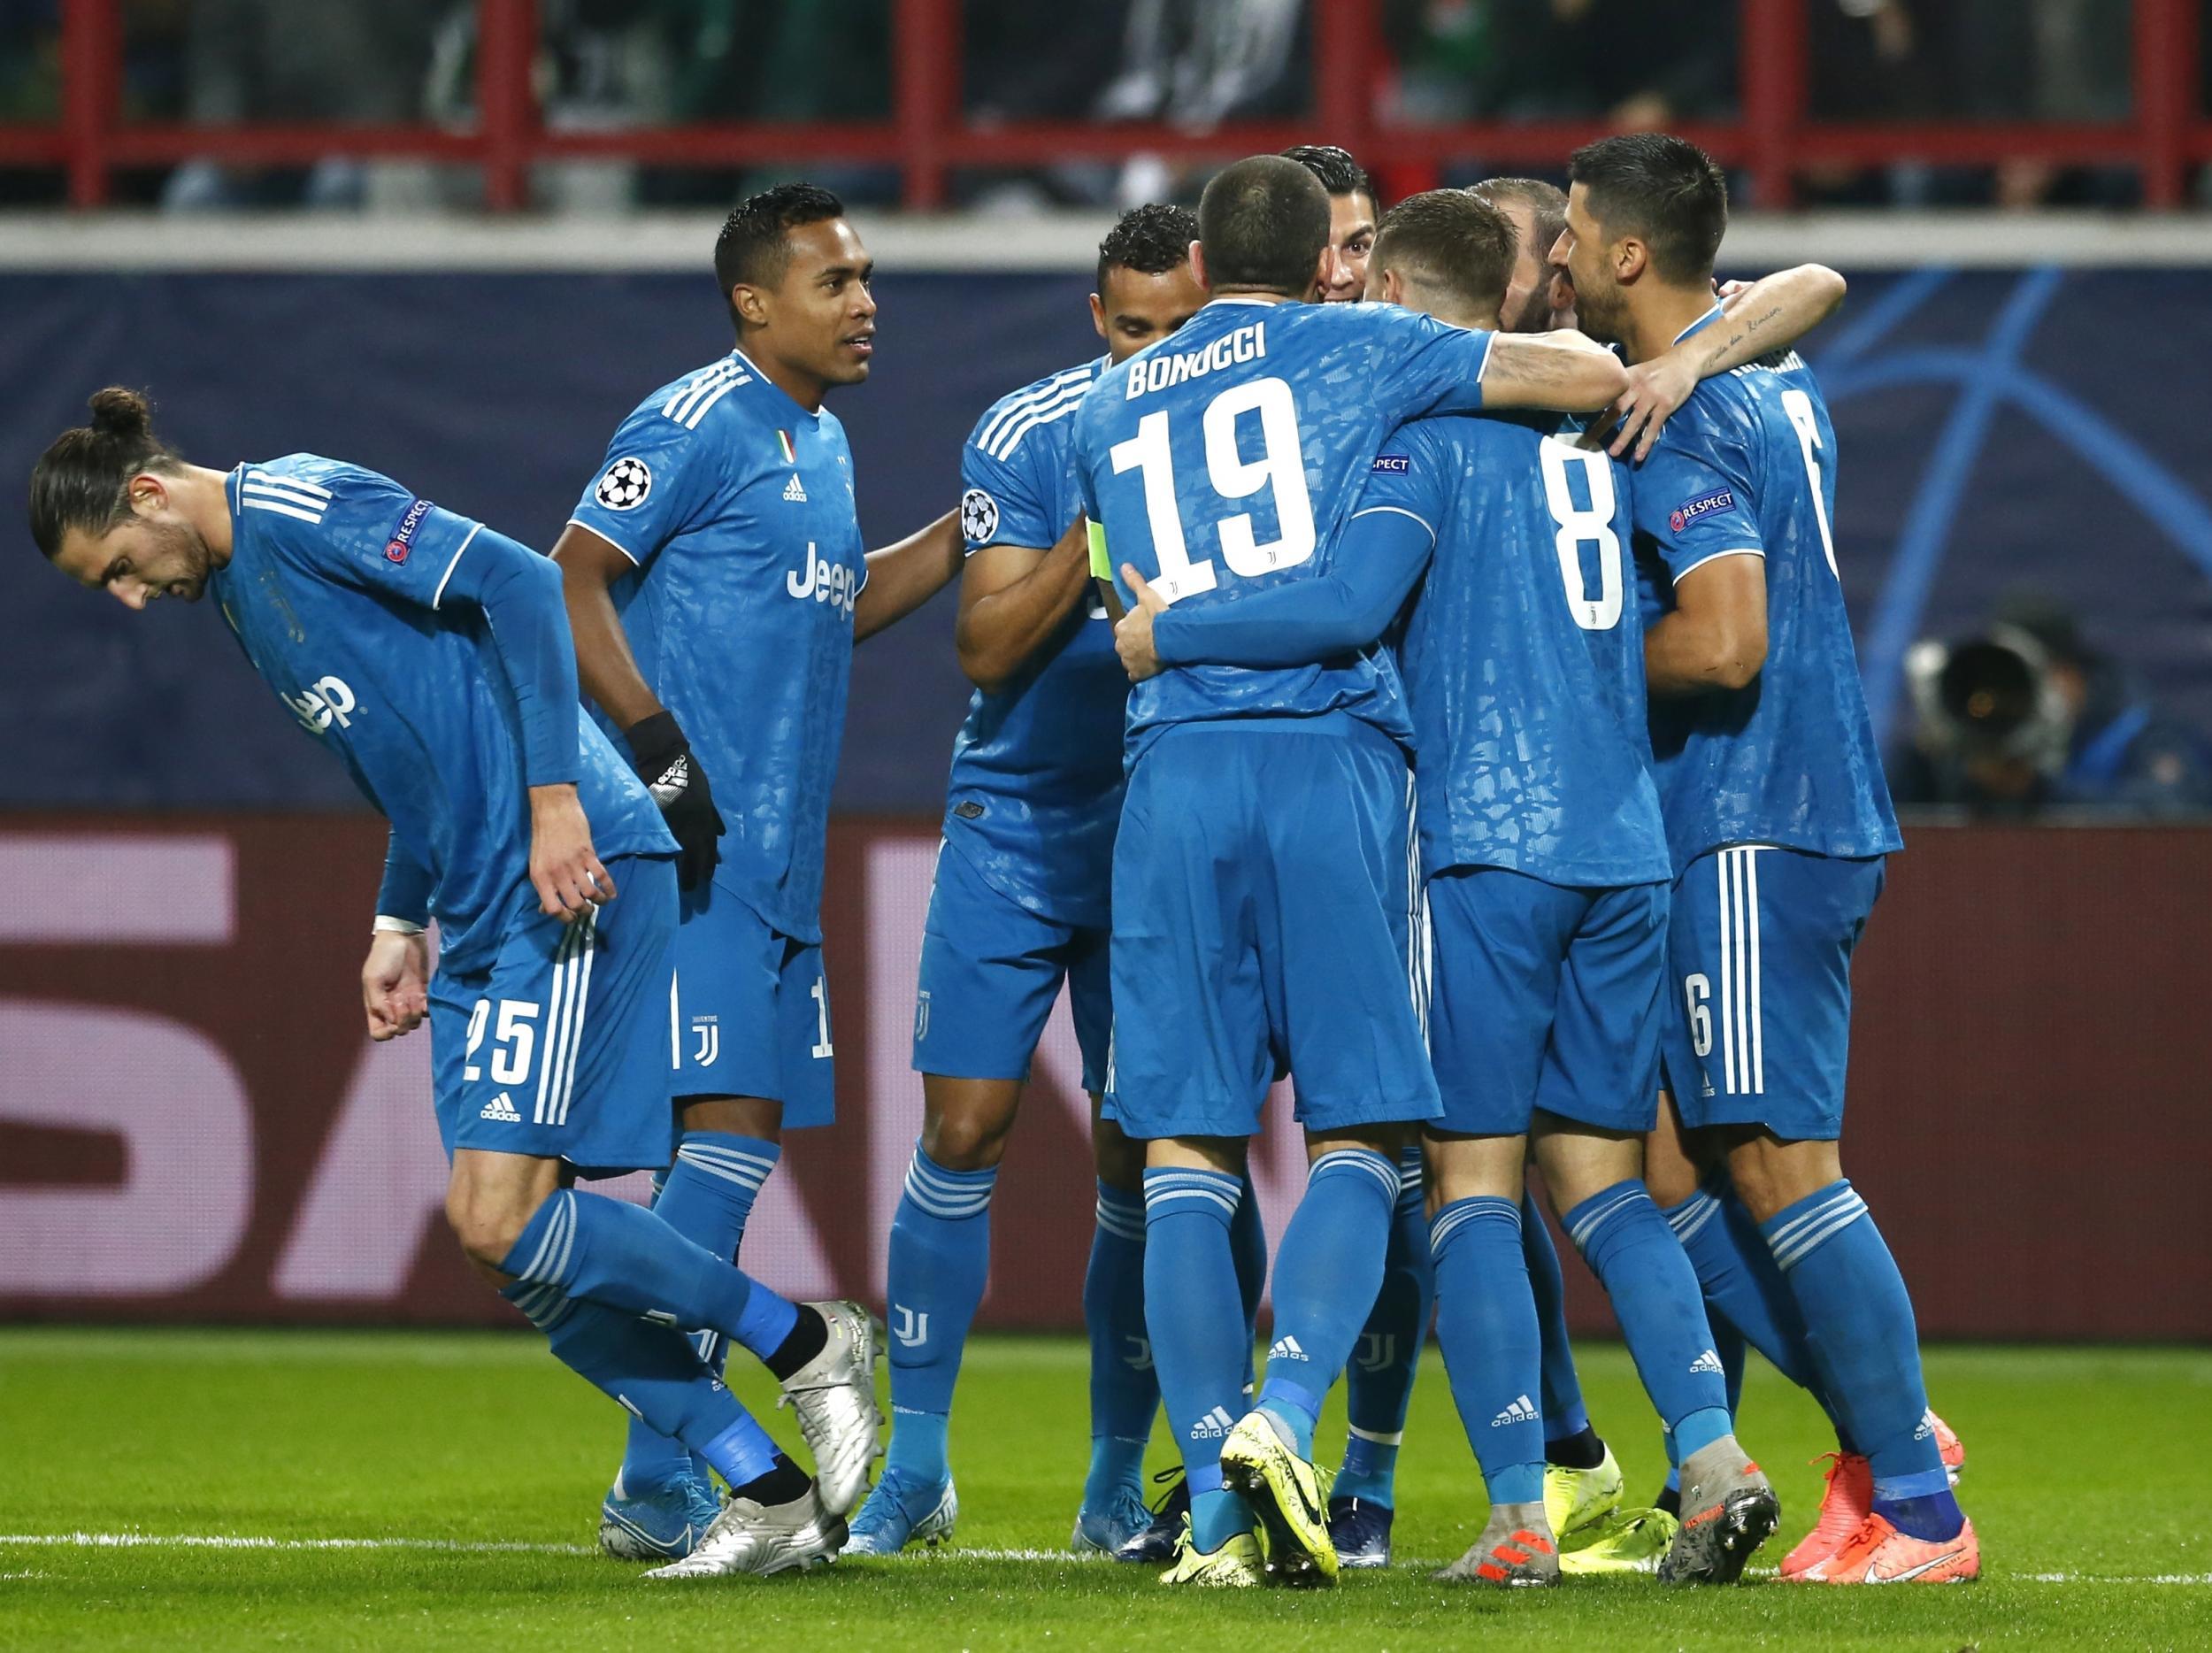 Lokomotiv vs Juventus LIVE: Score, goal updates and latest as Cristiano Ronaldo stars in Champions League